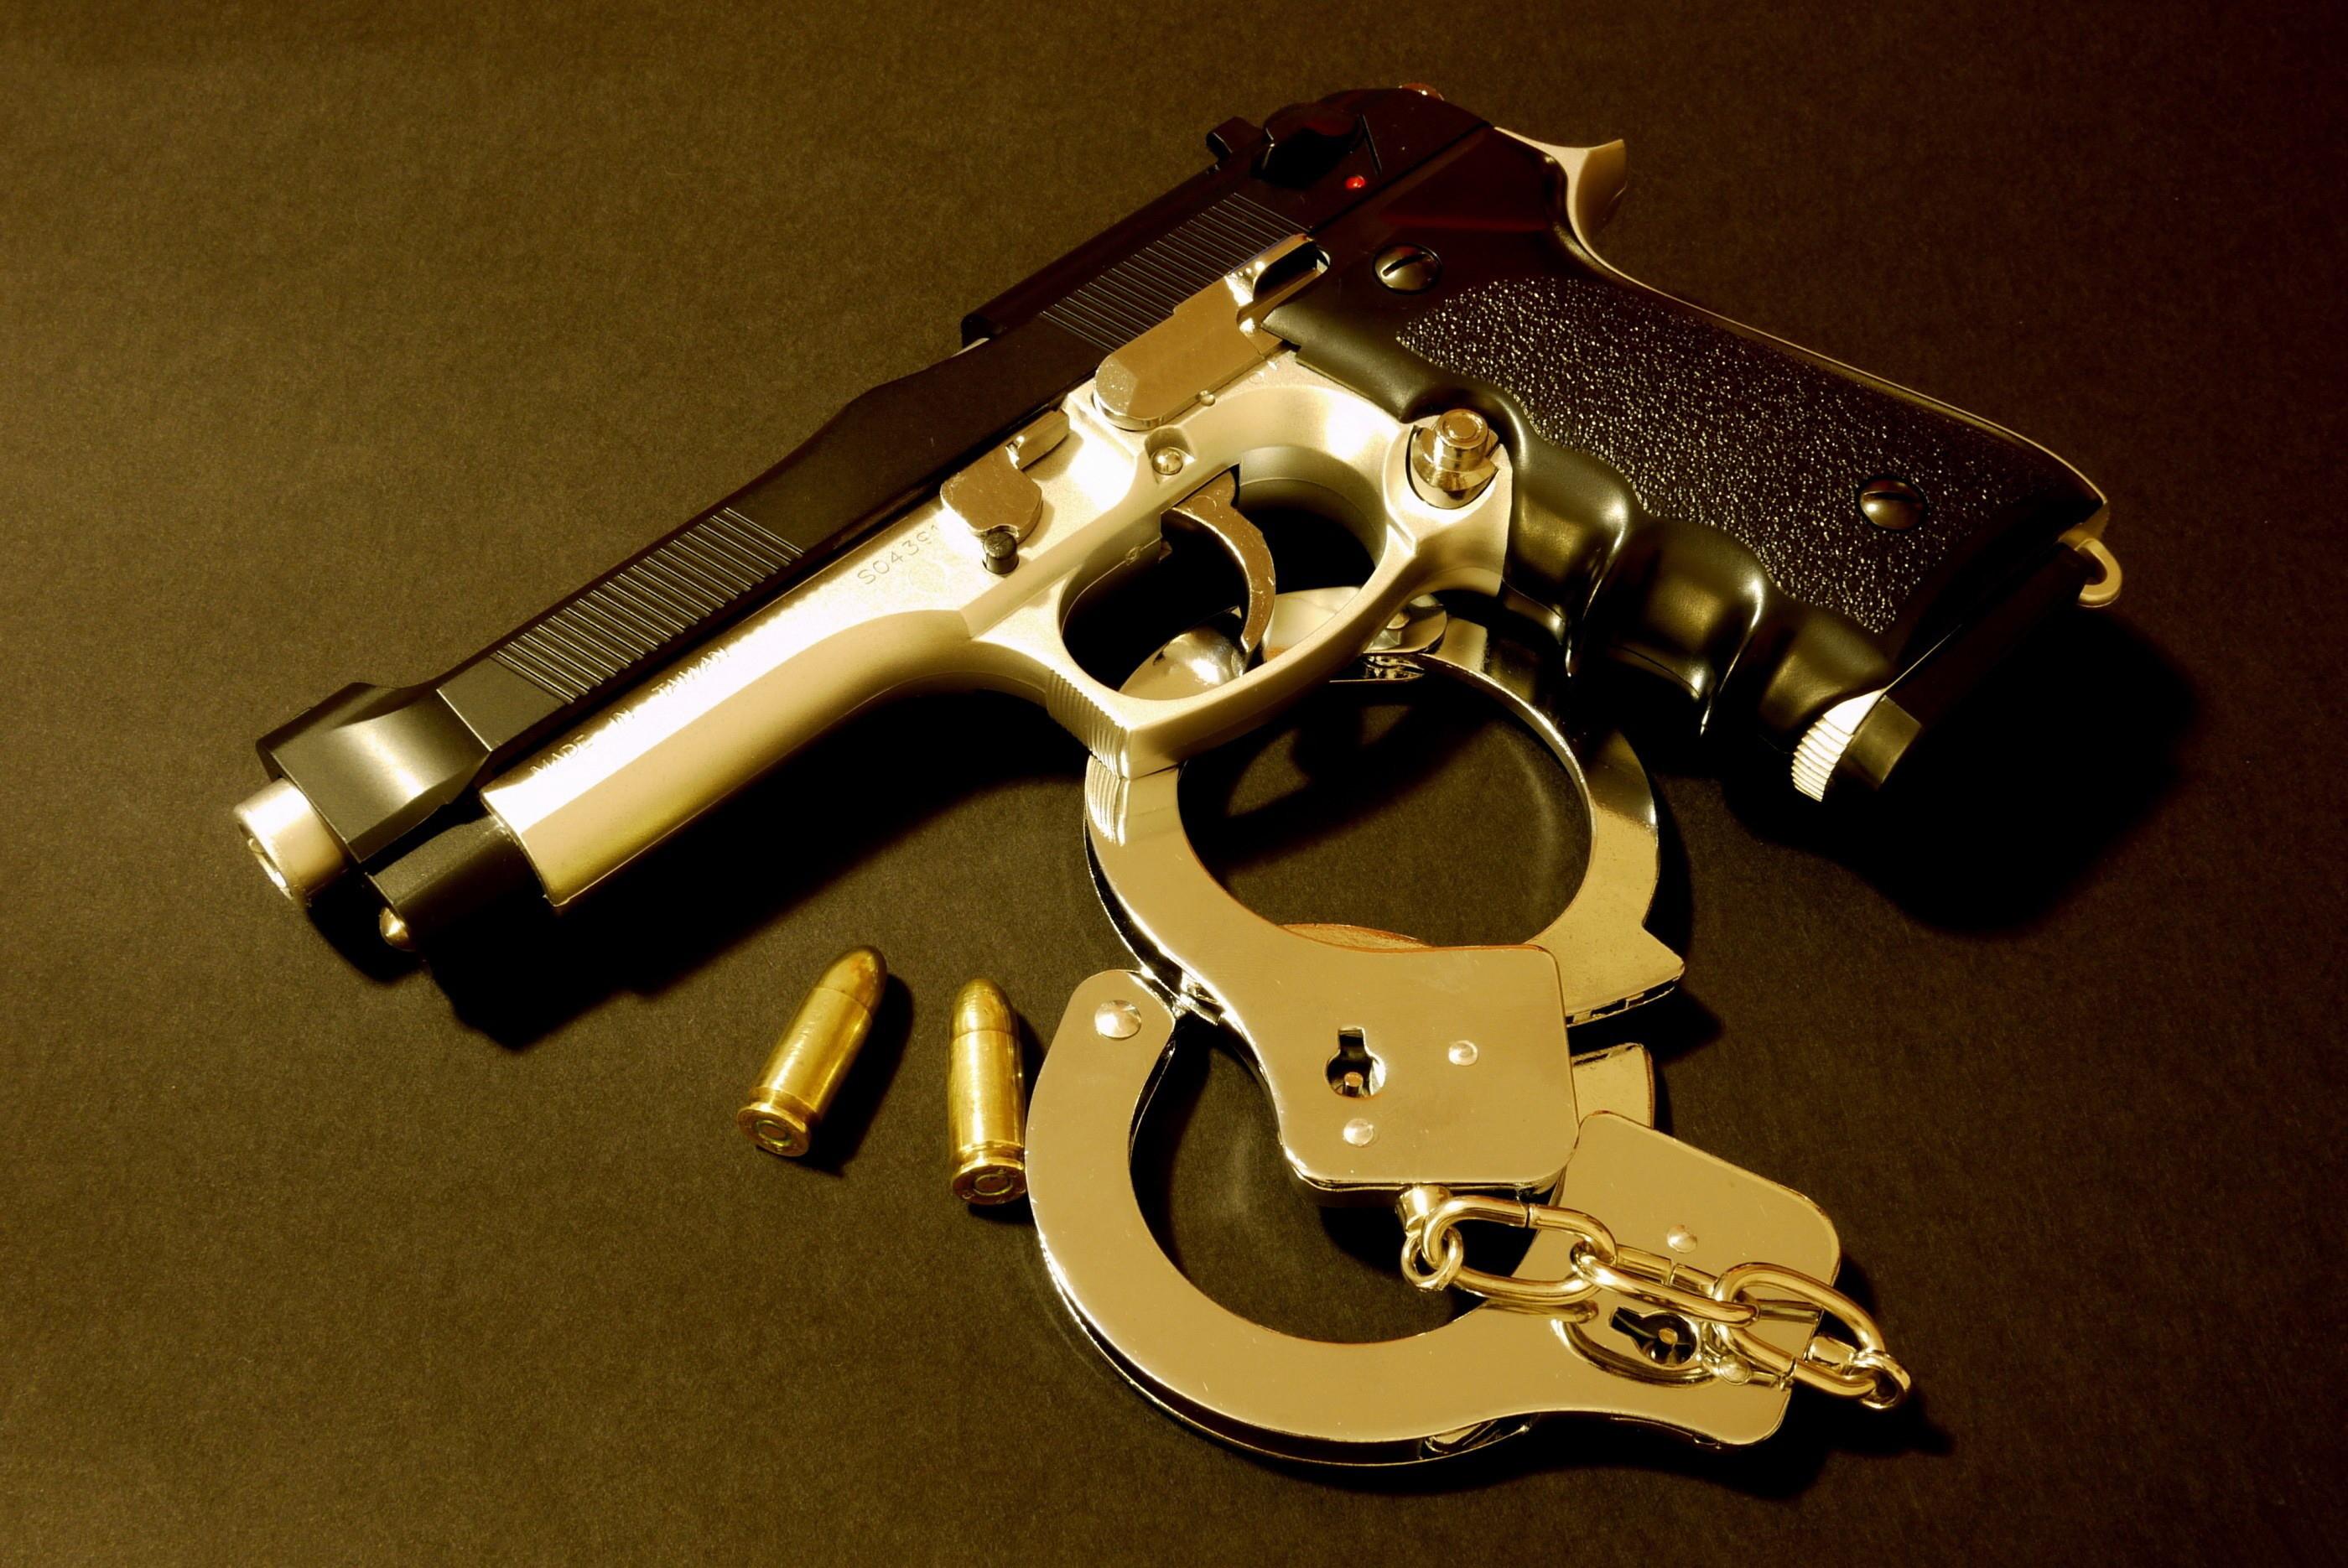 pistol, handcuffs, bullet, weapon, police